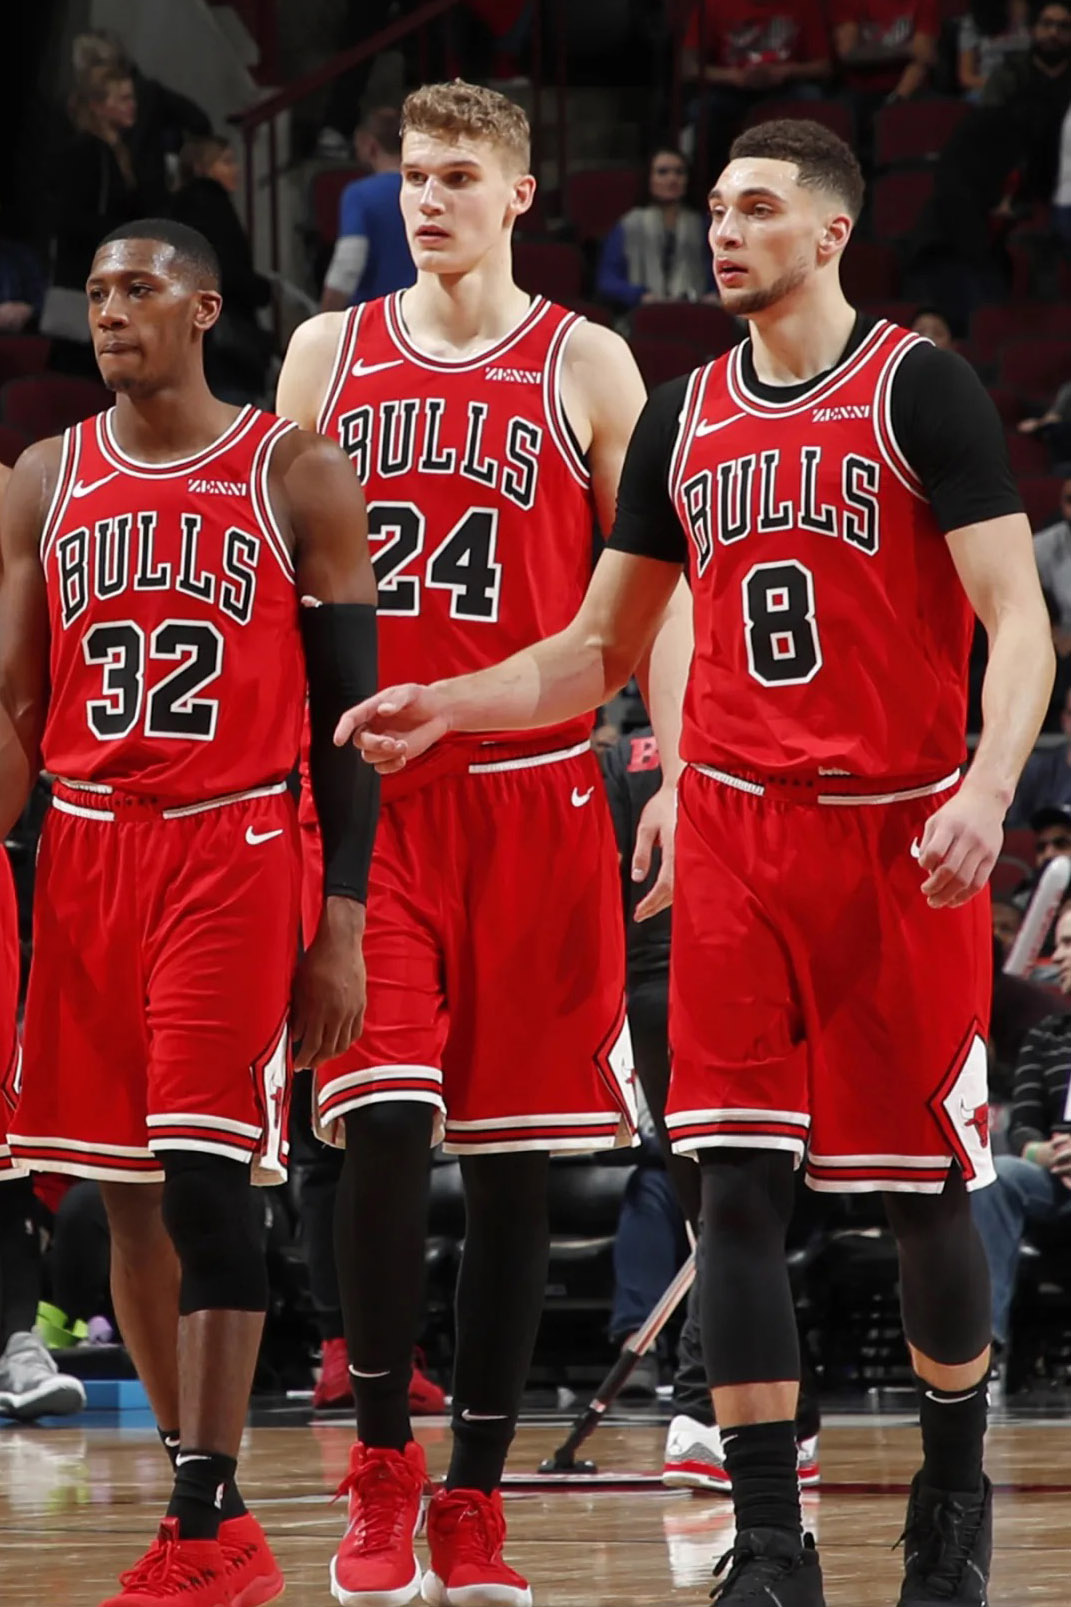 2019 Chicago Bulls season